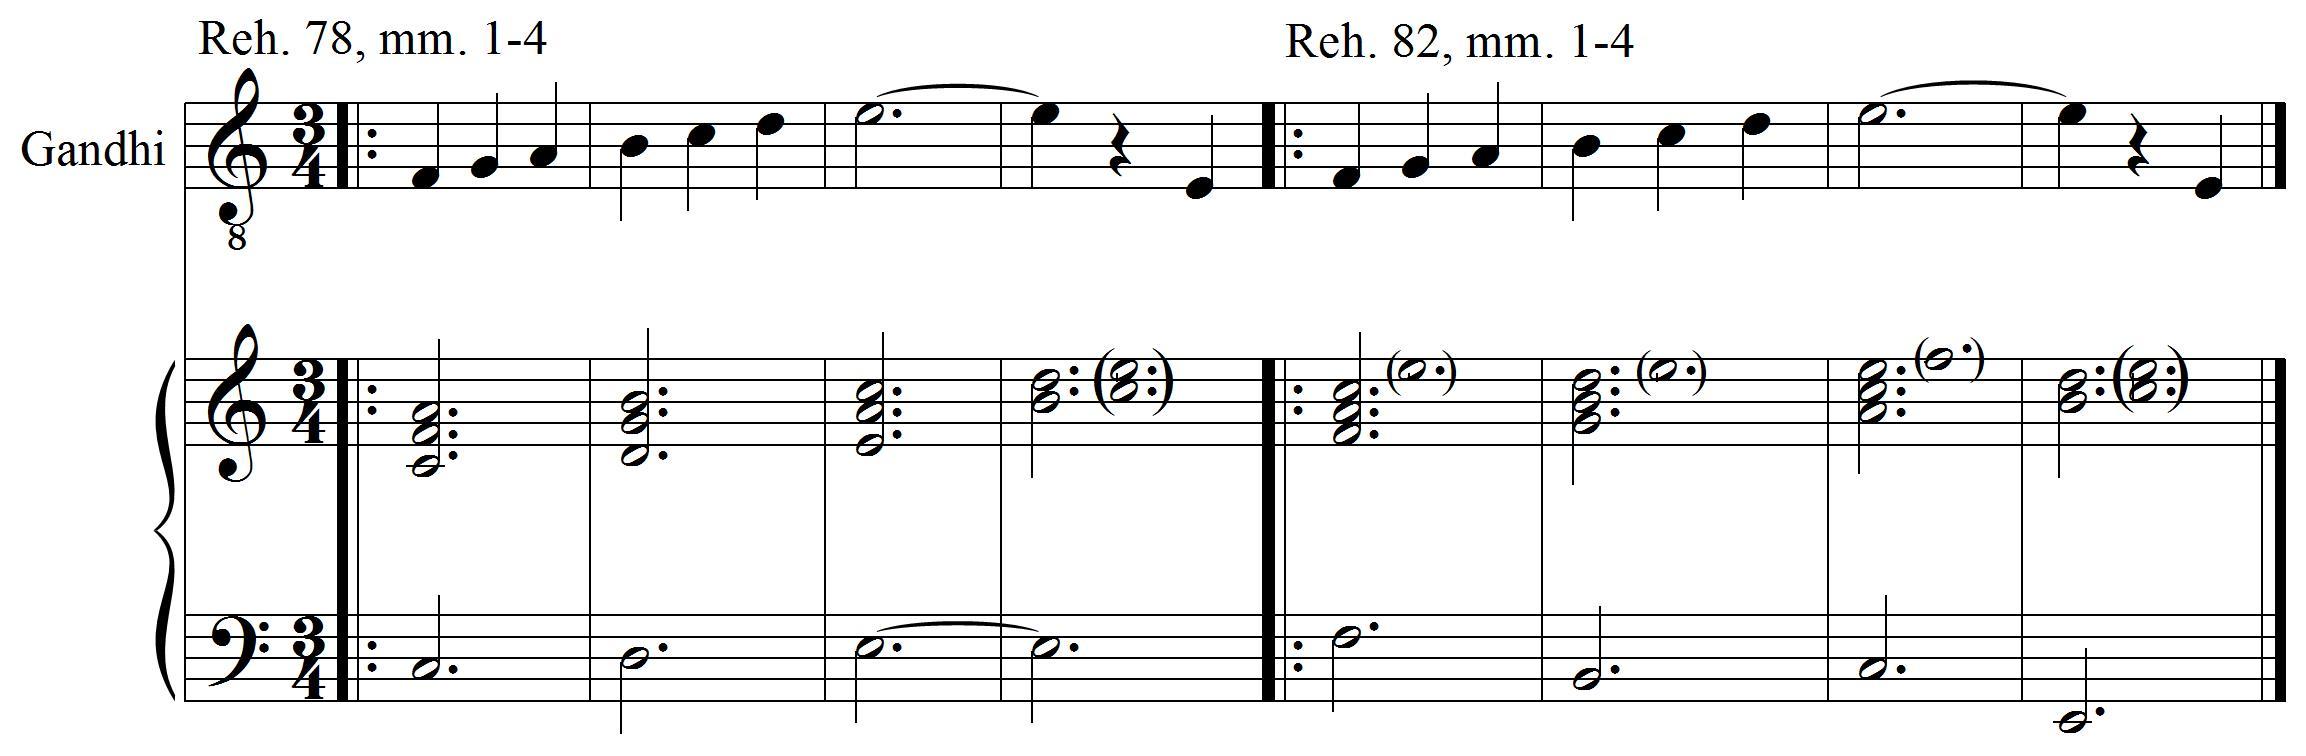 harmony example 2